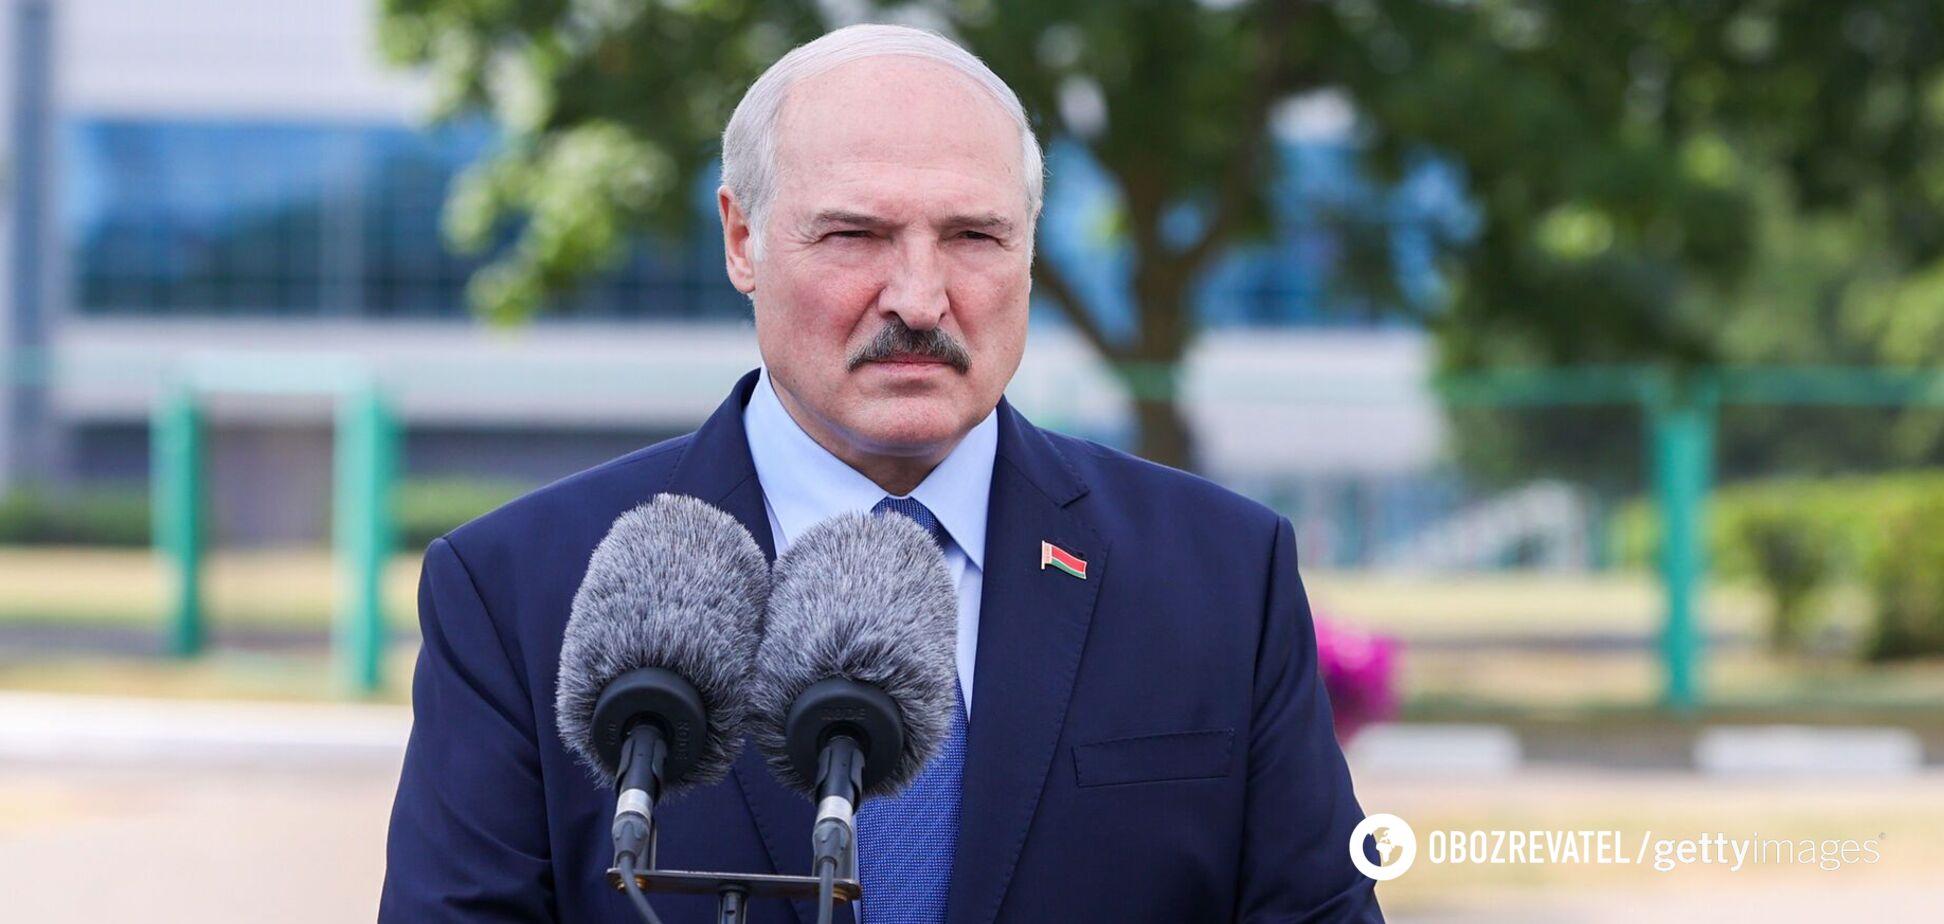 Александр Лукашенко якобы перенес инсульт